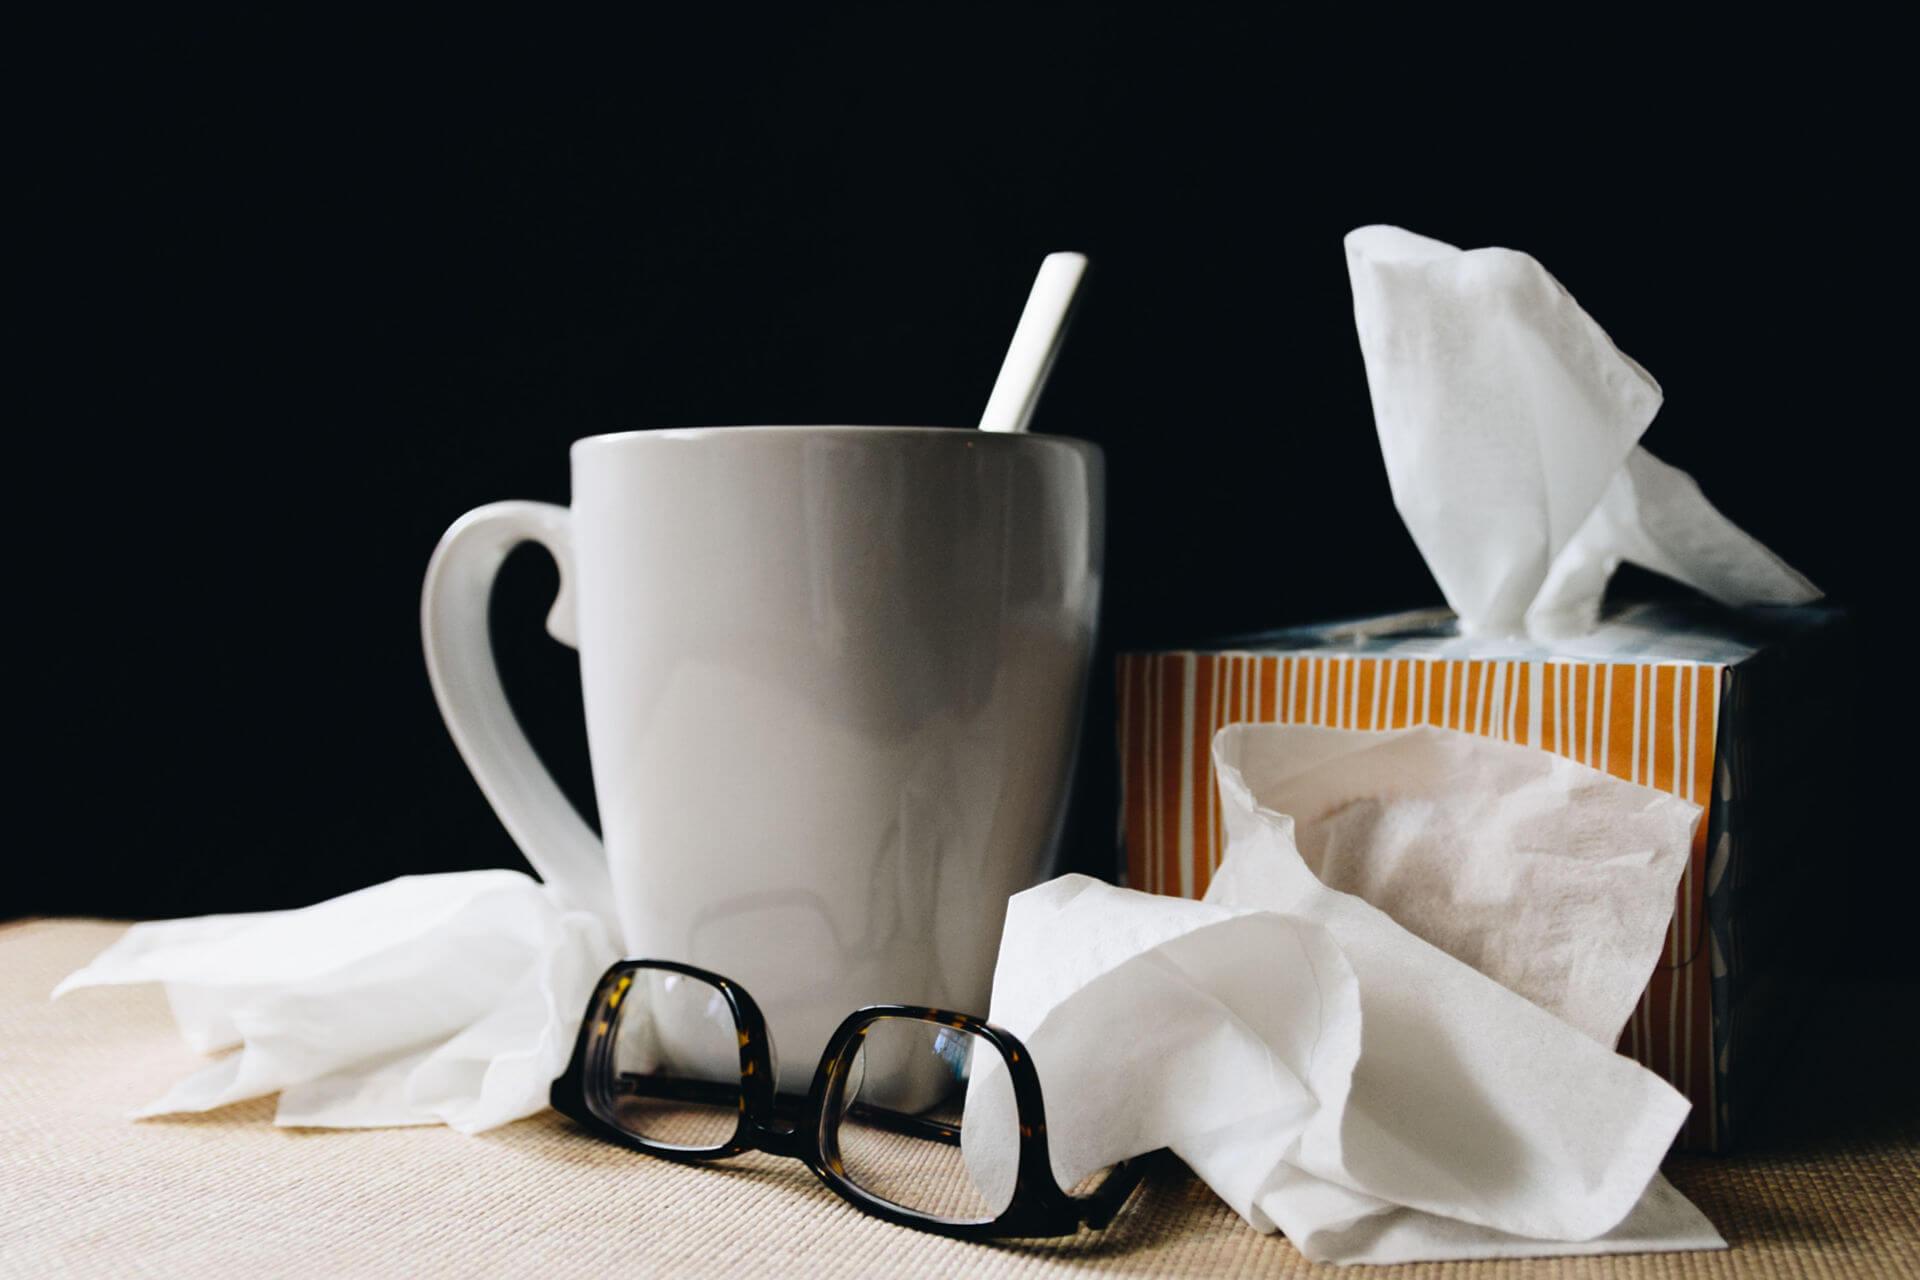 preventing spread of flu